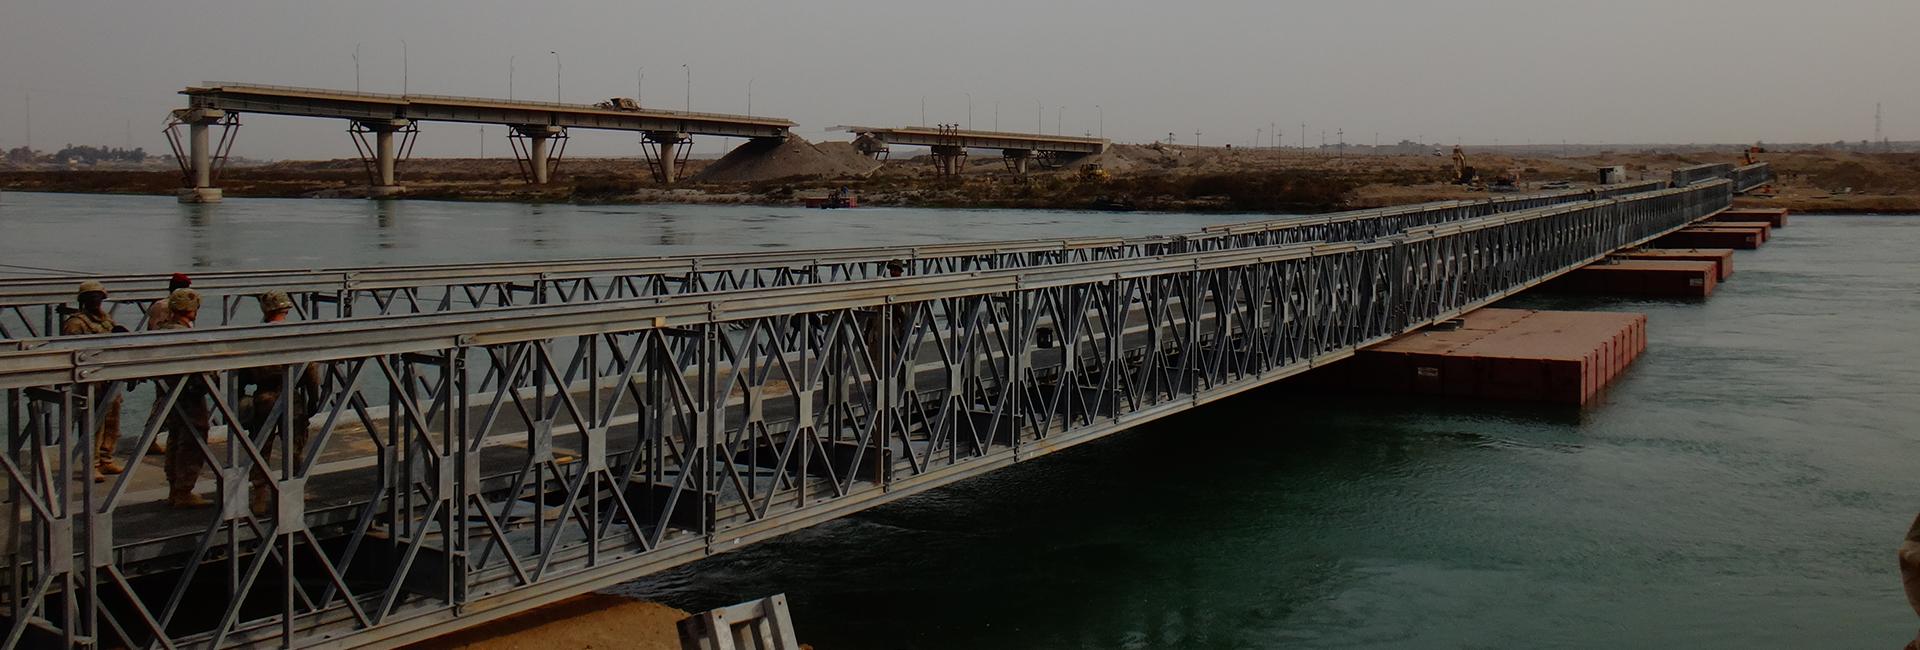 Military Modular Bridge